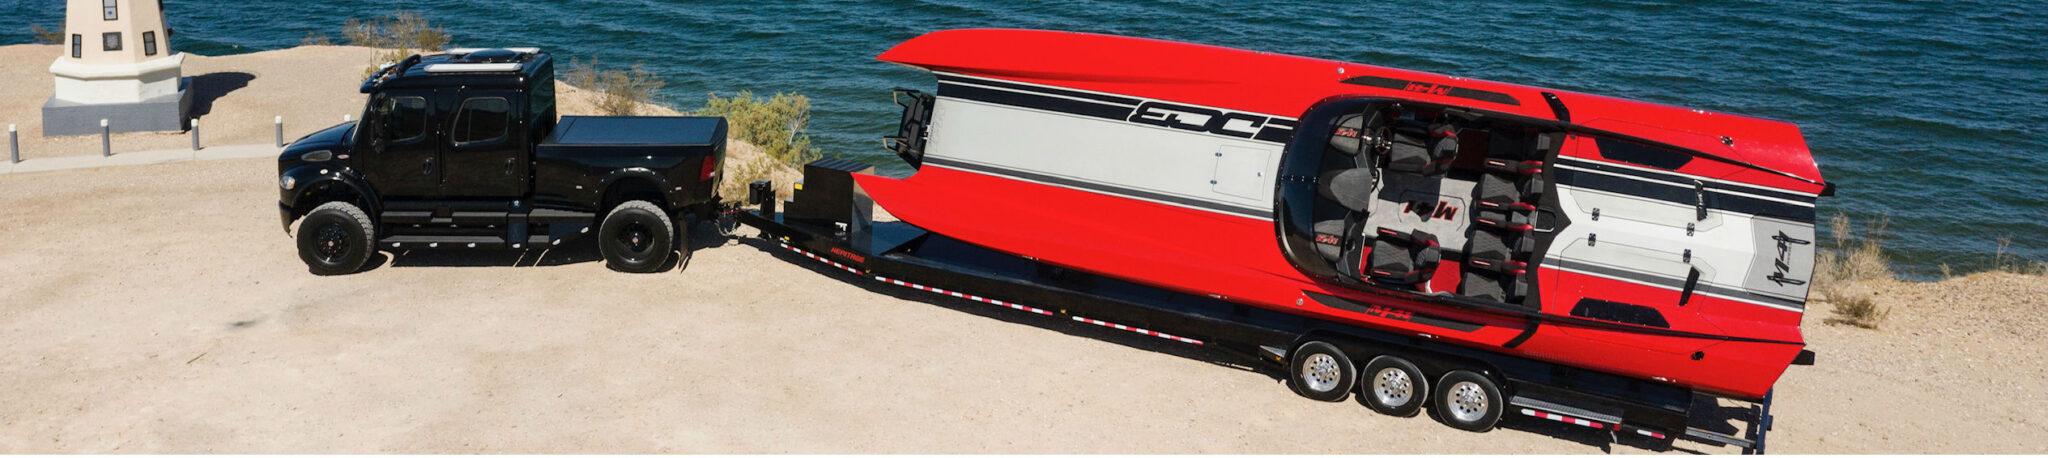 m41 dcb rockstarboats